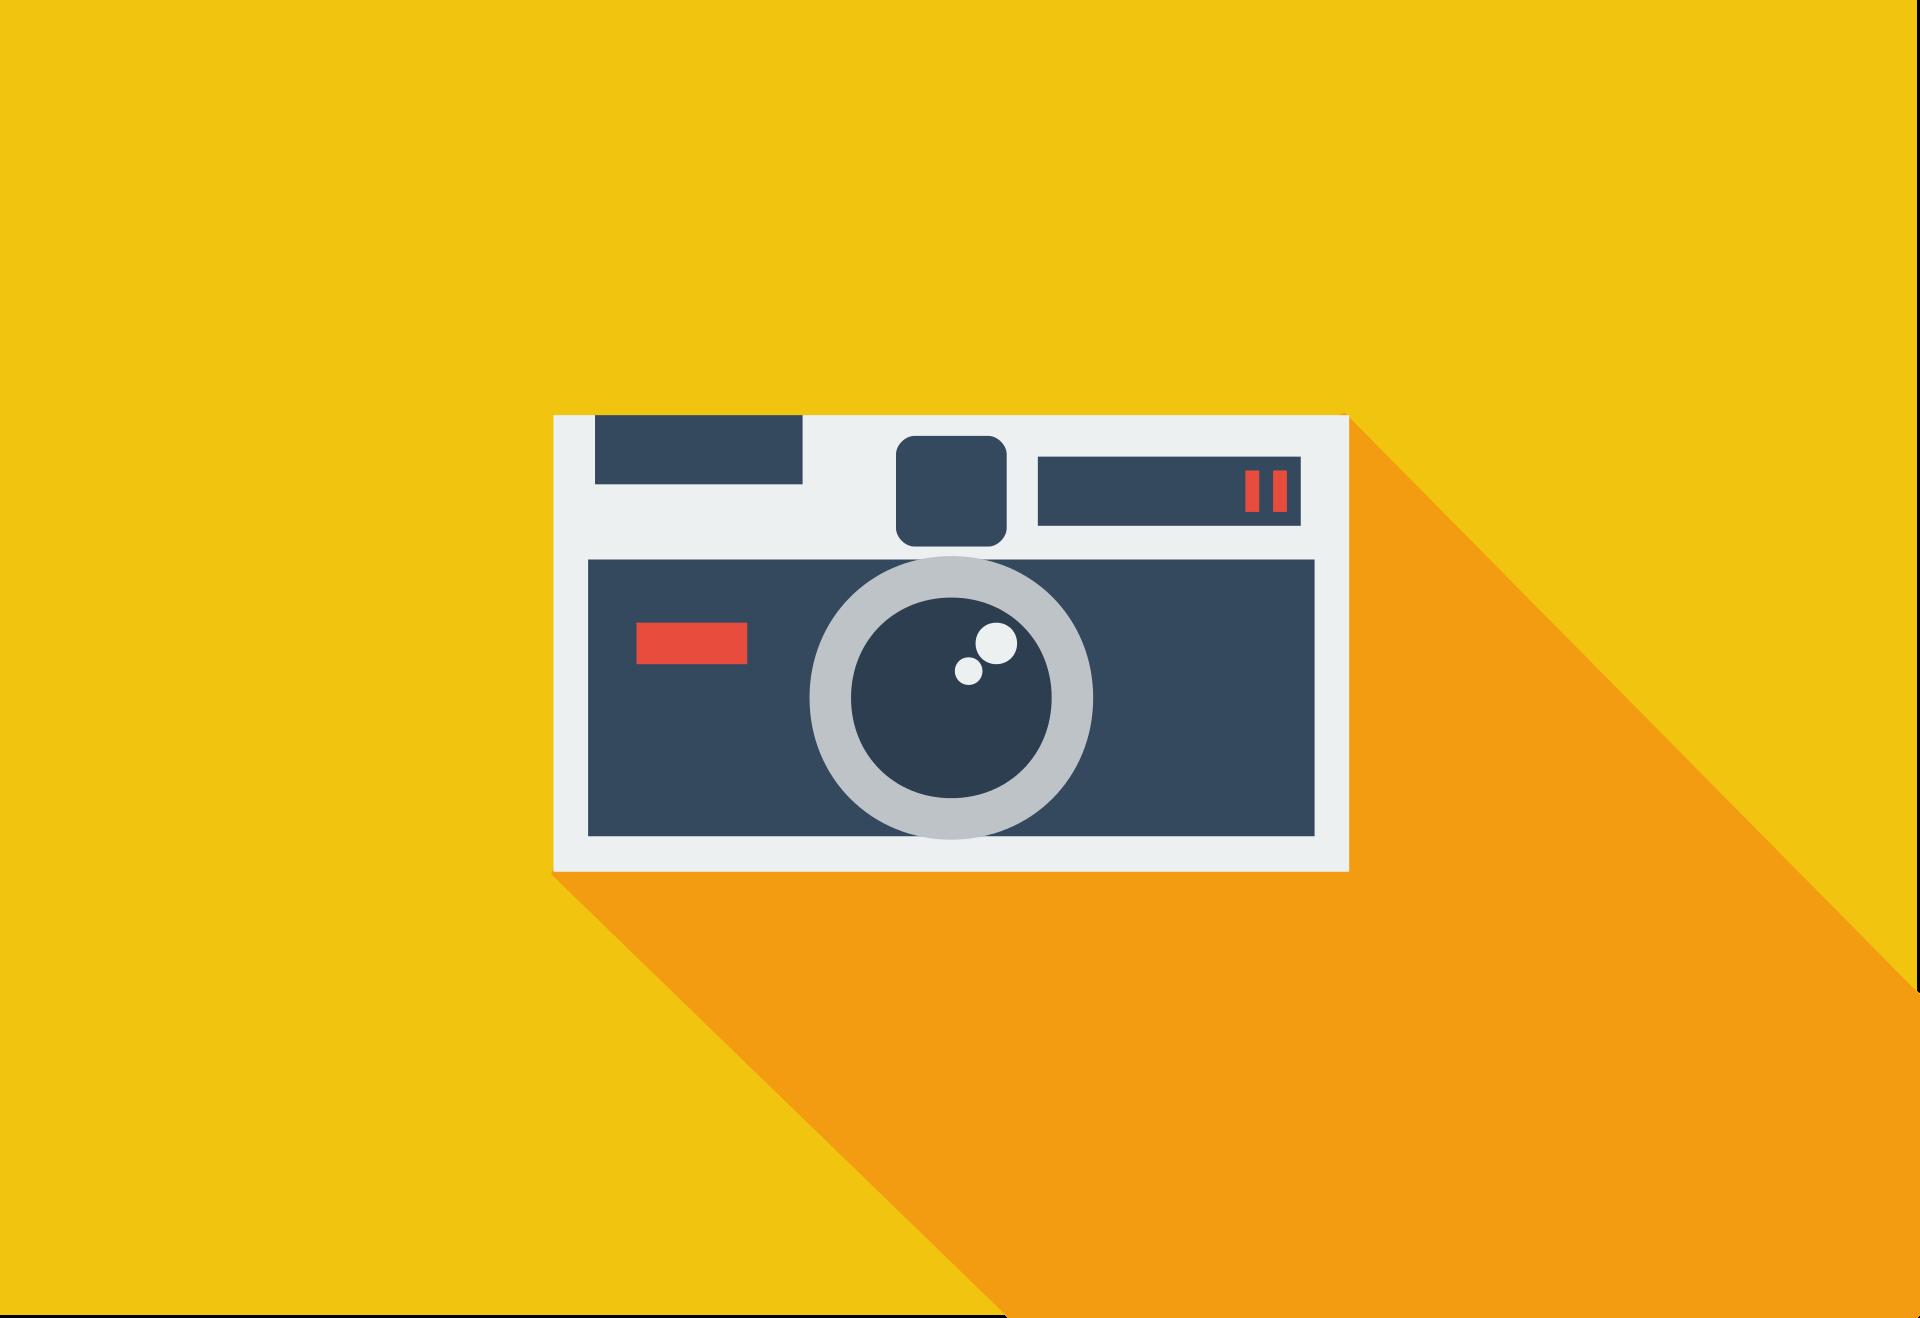 cámara, fotografía, flat design, diseño plano, amarillo - Fondos de Pantalla HD - professor-falken.com